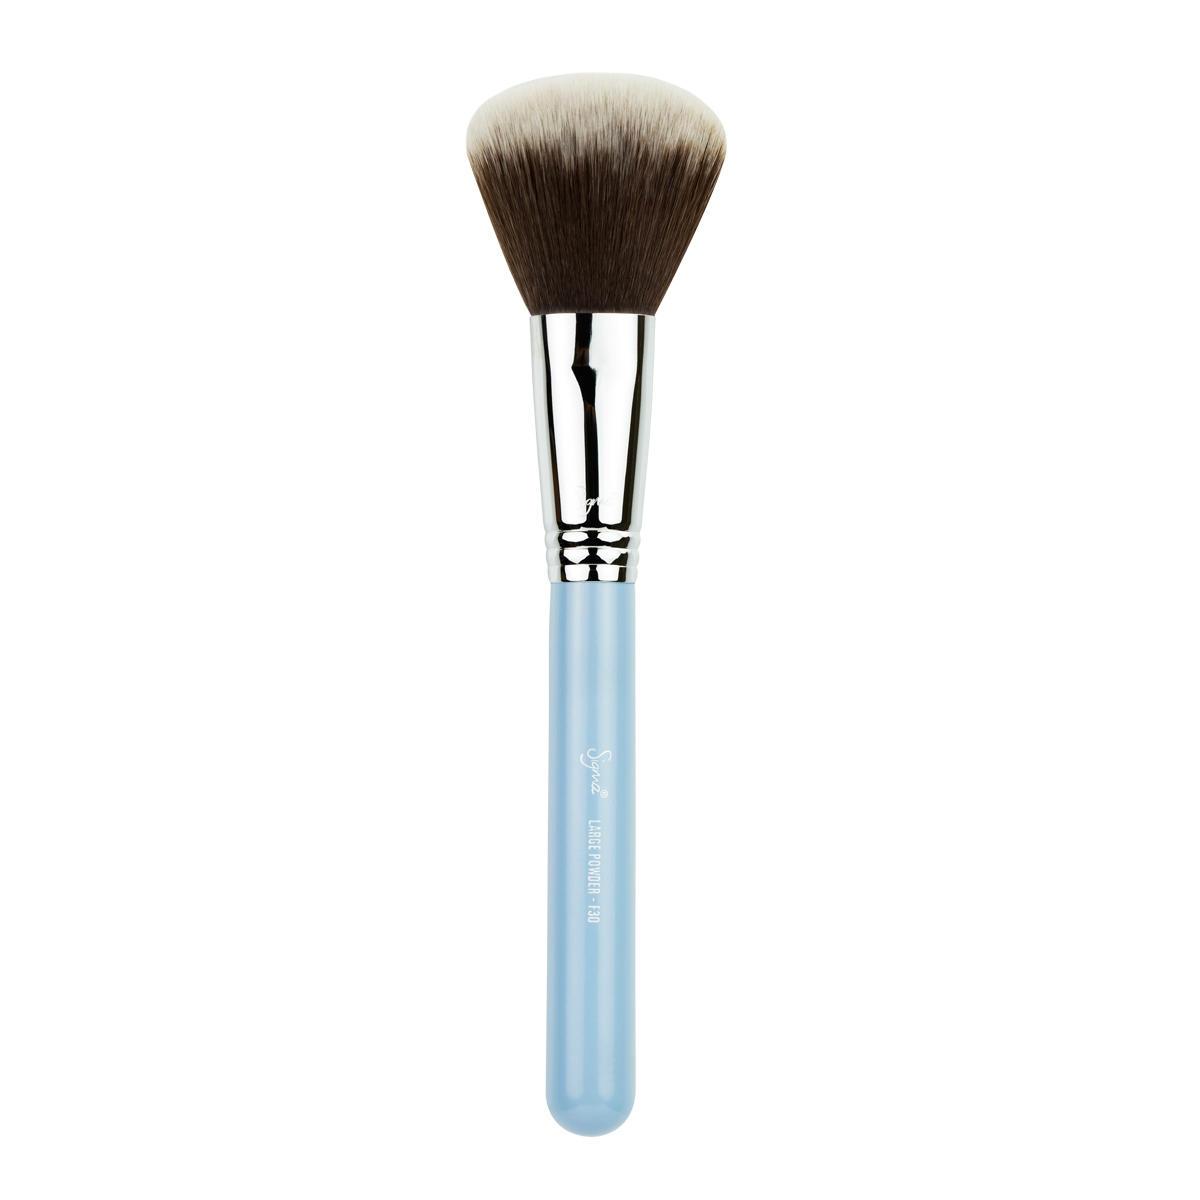 Sigma Large Powder Face Brush F30 Light Blue